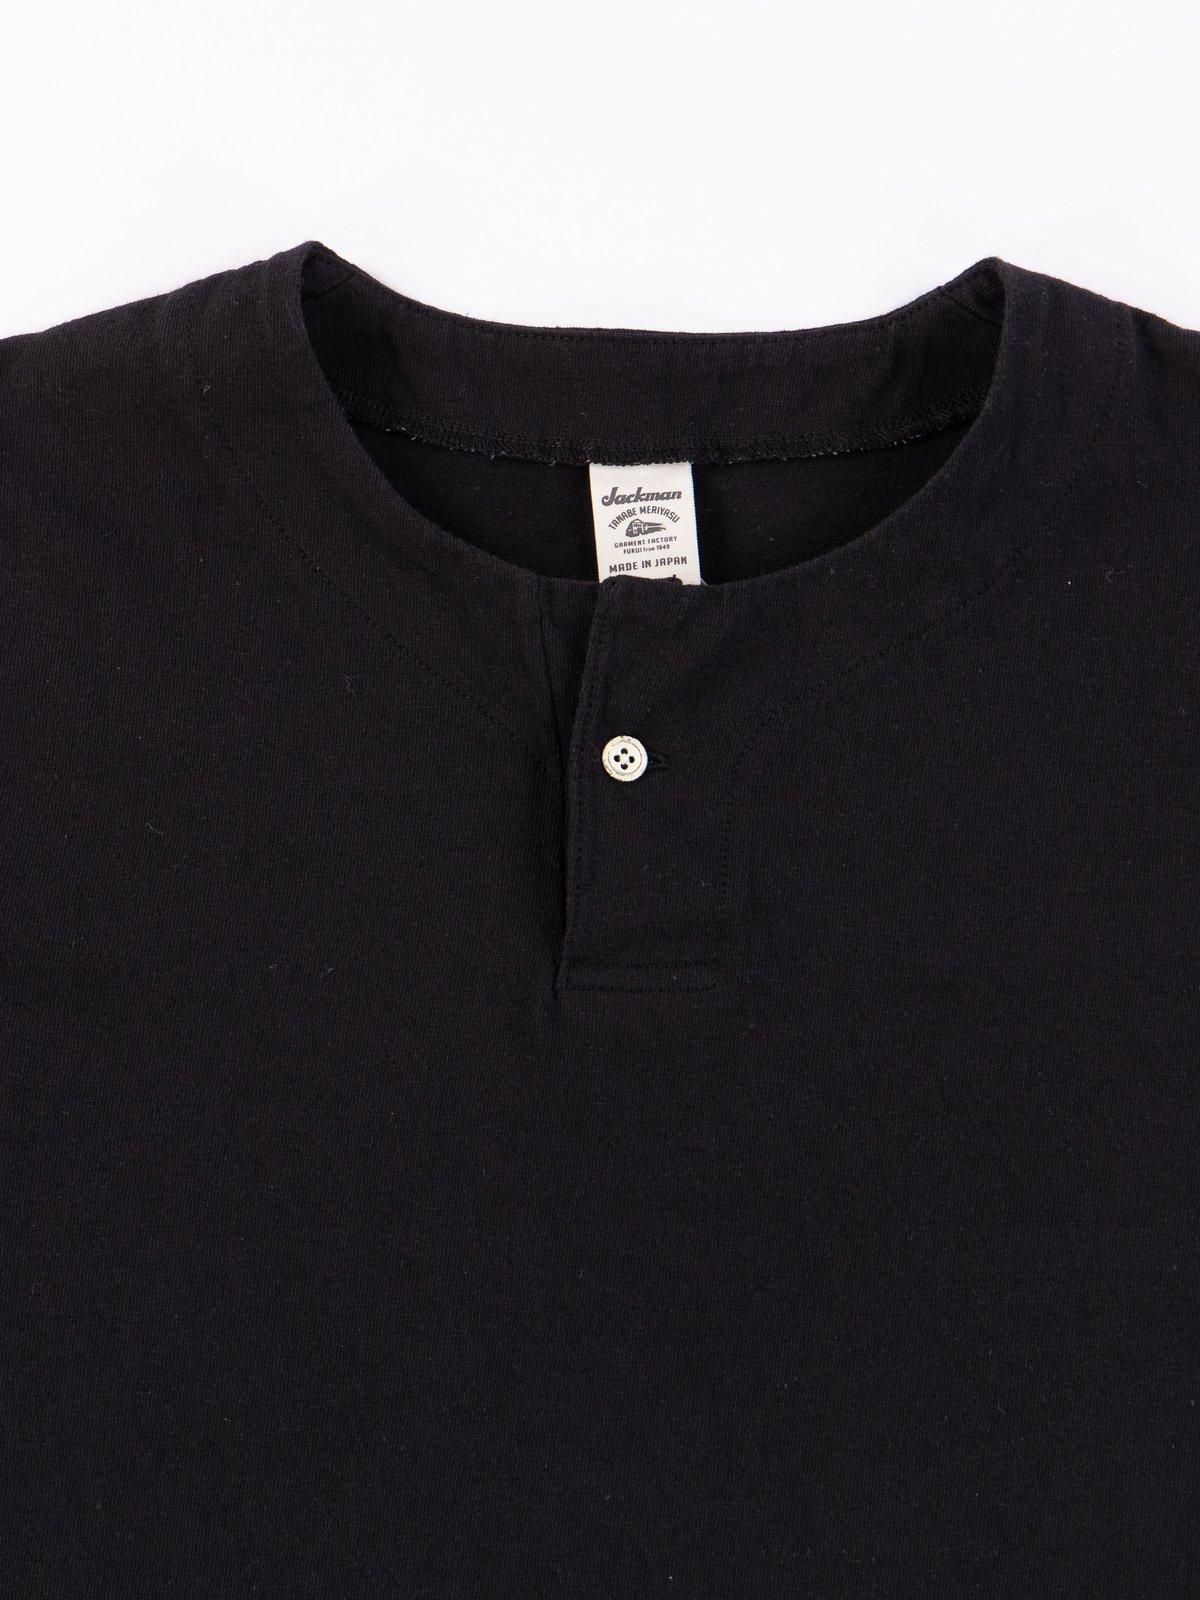 Black Henley T–Shirt - Image 3